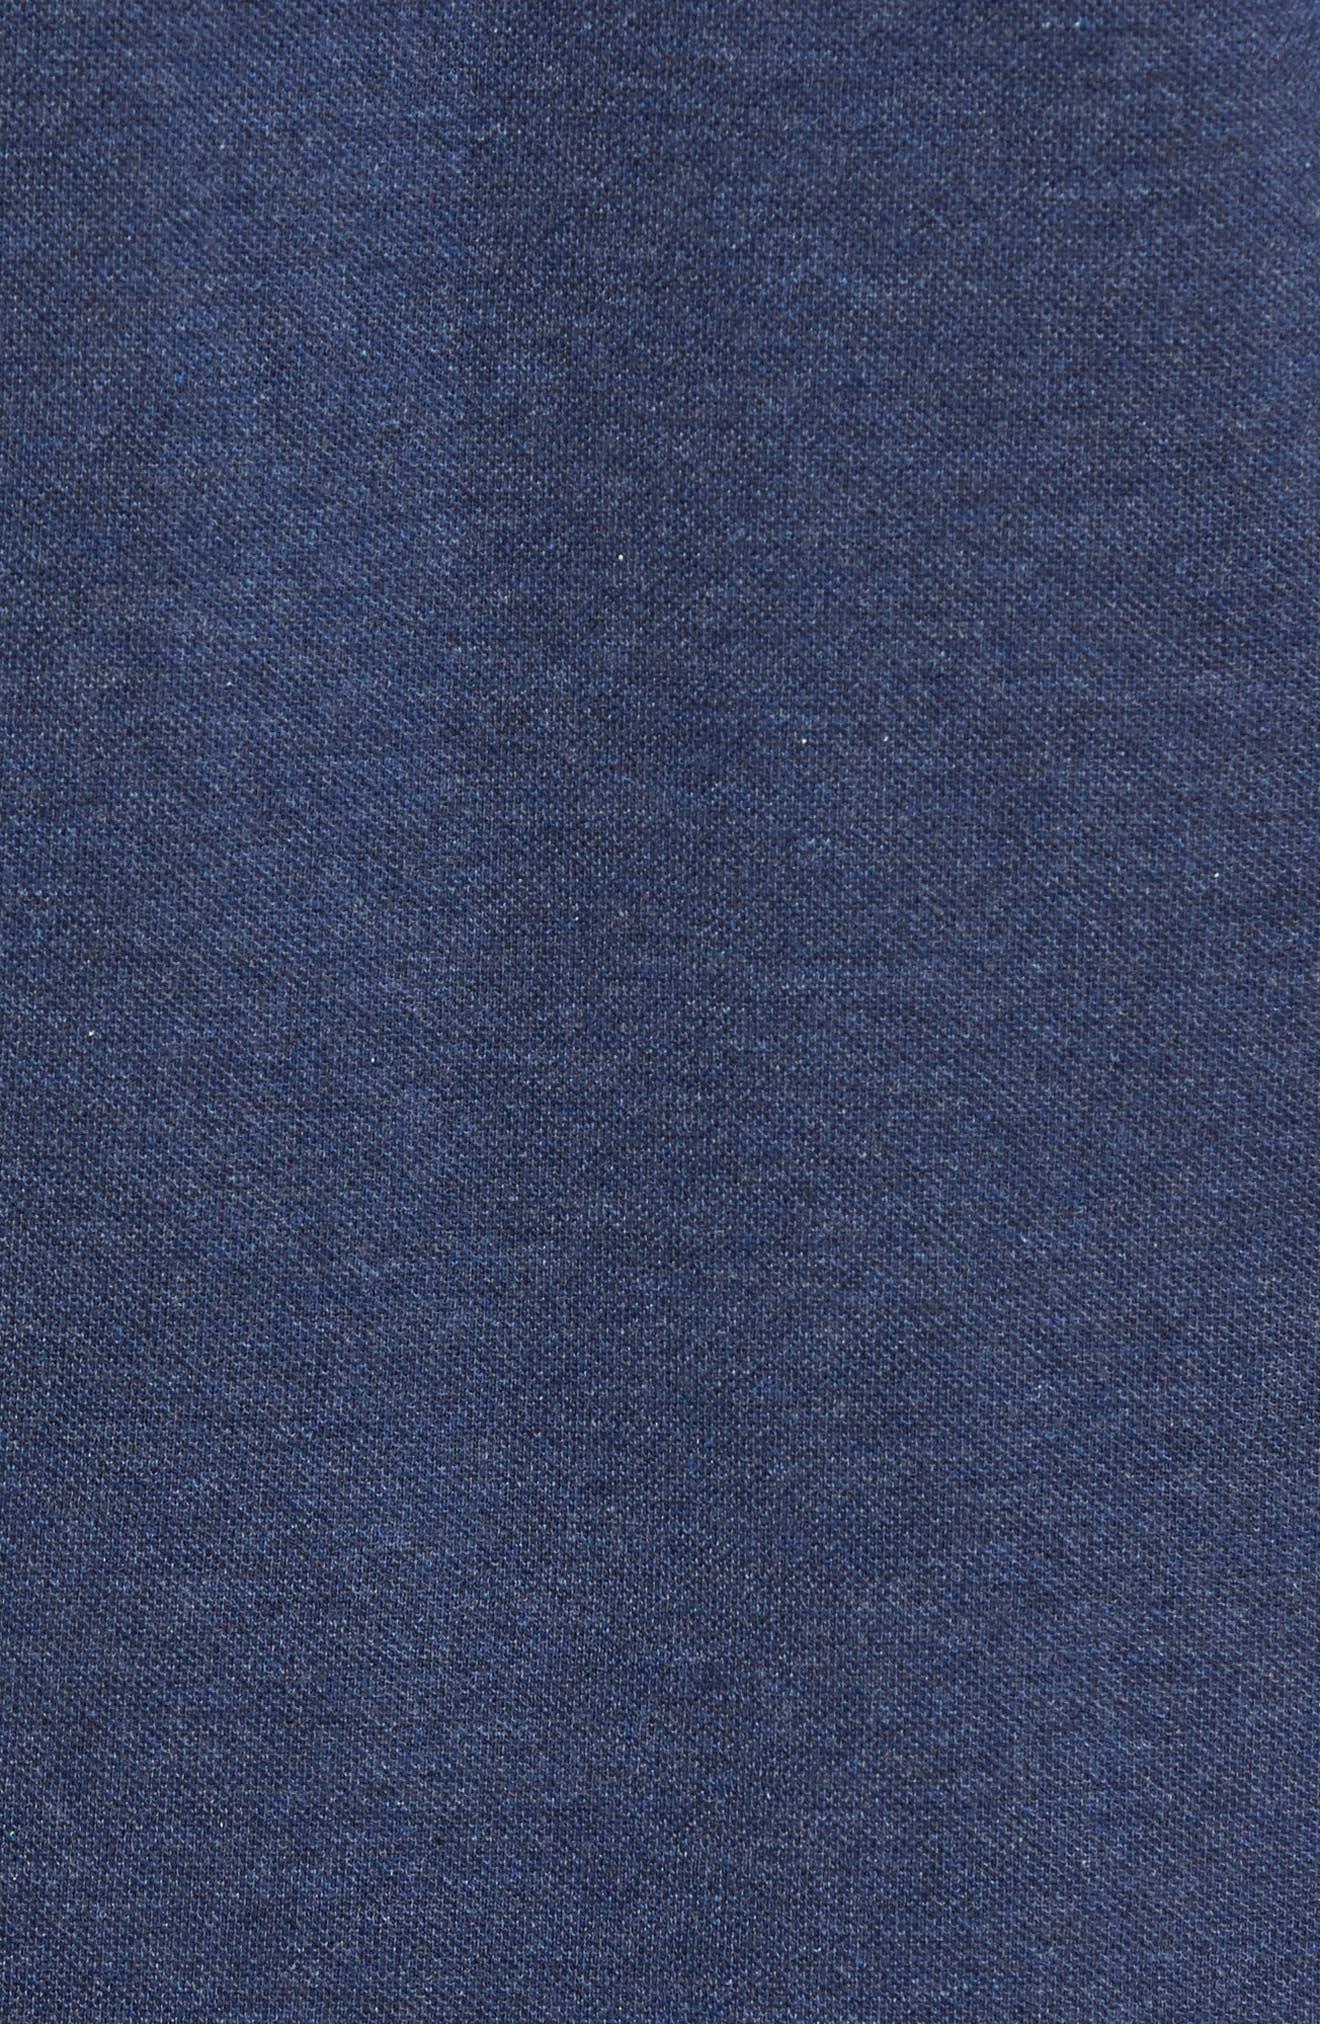 Regular Fit Pocket Piqué Polo,                             Alternate thumbnail 36, color,